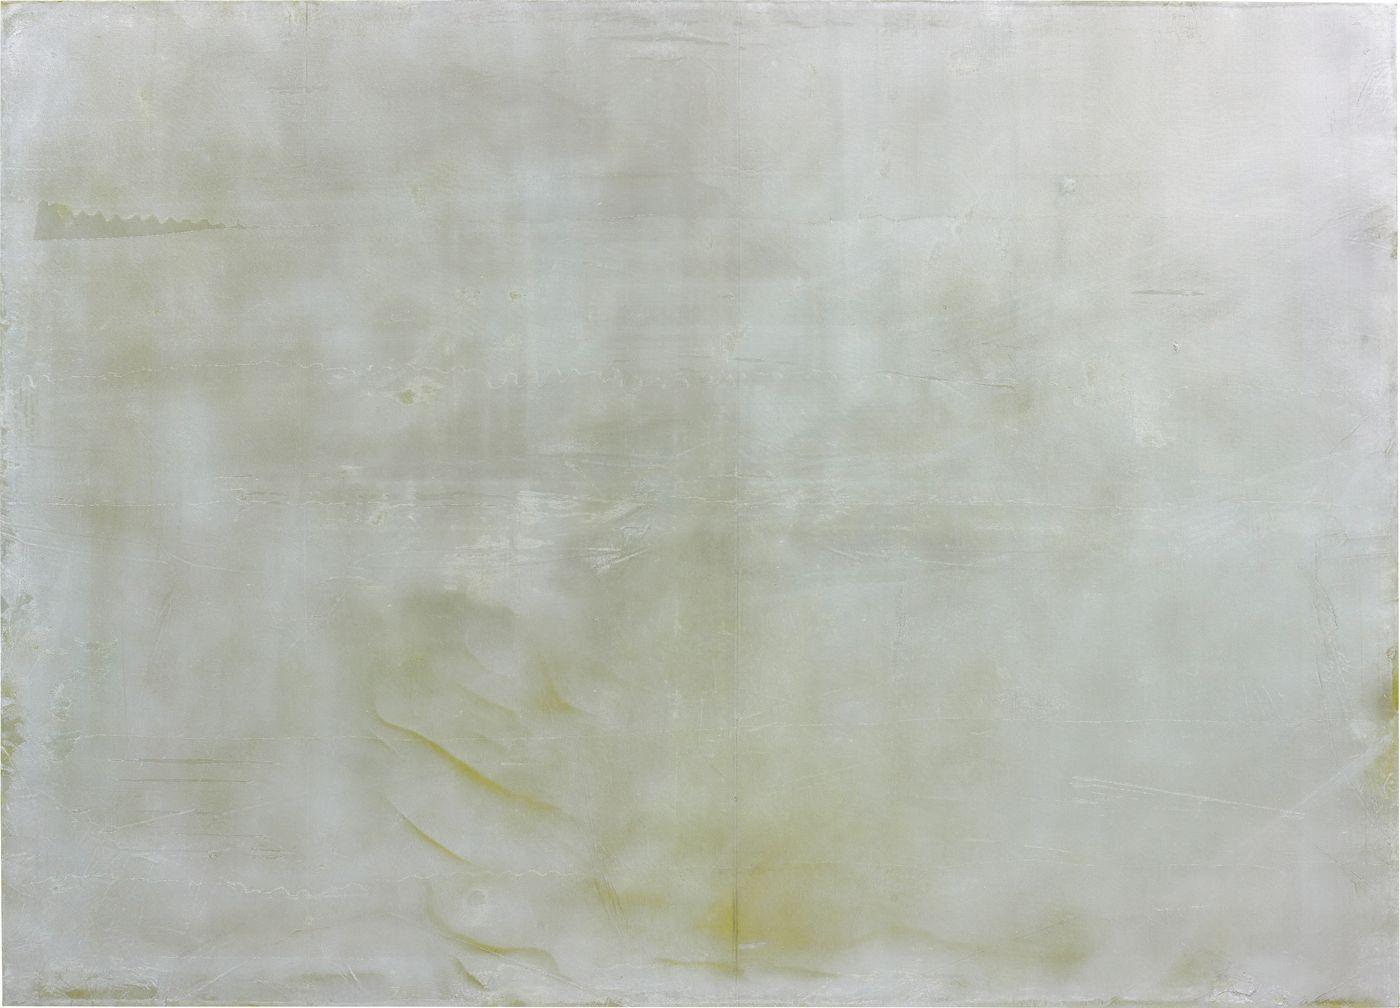 phillips rudolf stingel painting below the surface